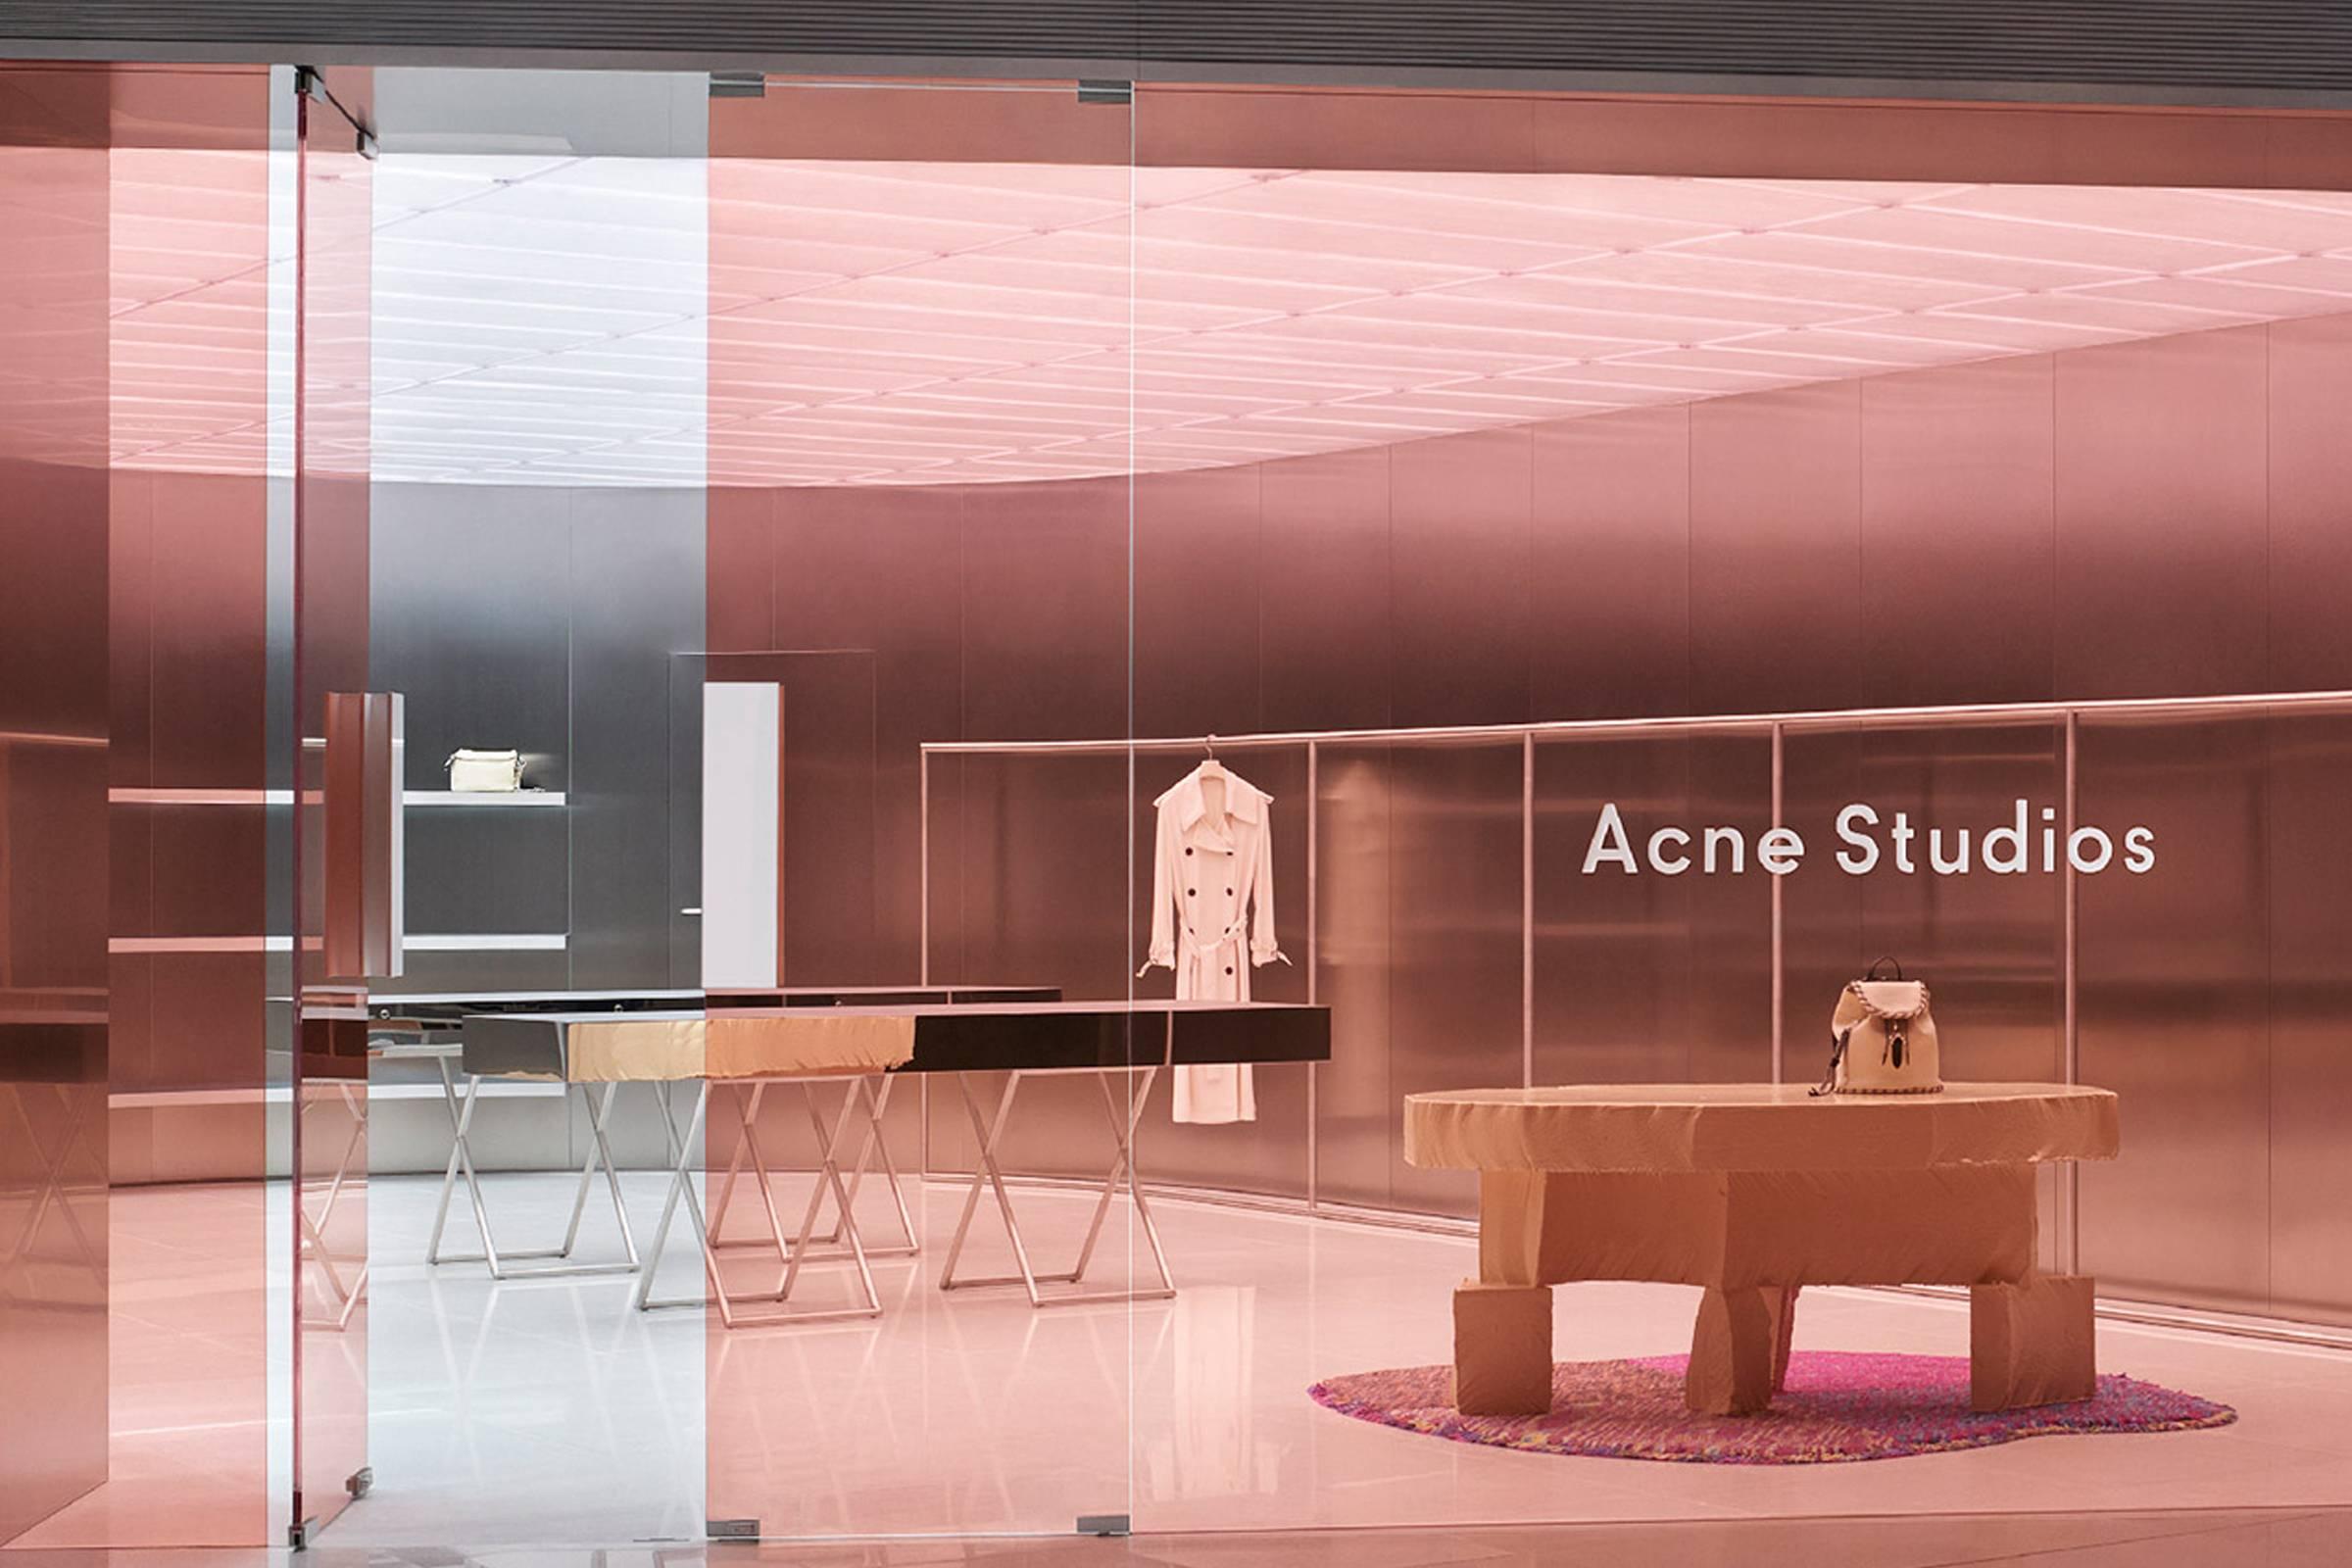 Acne Studios Hong Kong store